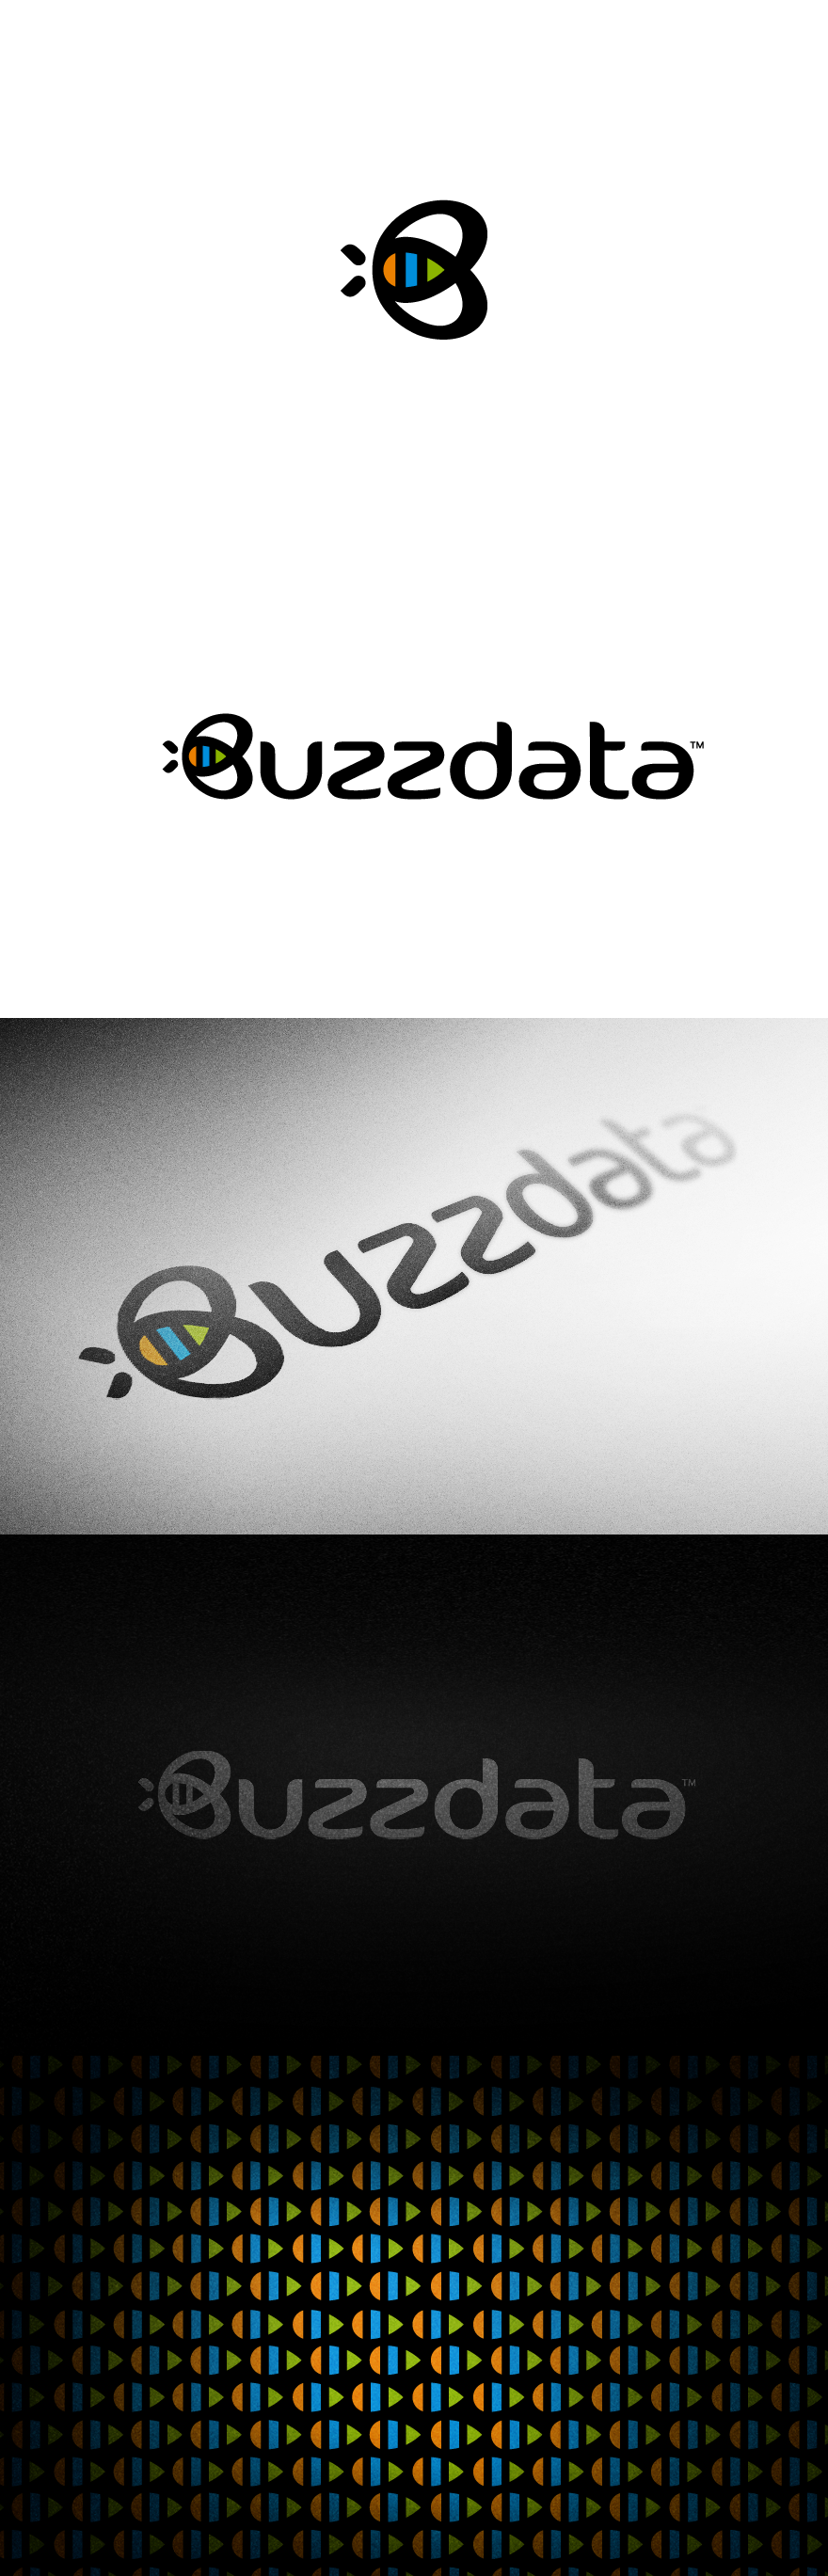 buzzdata.com - Logos - Creattica